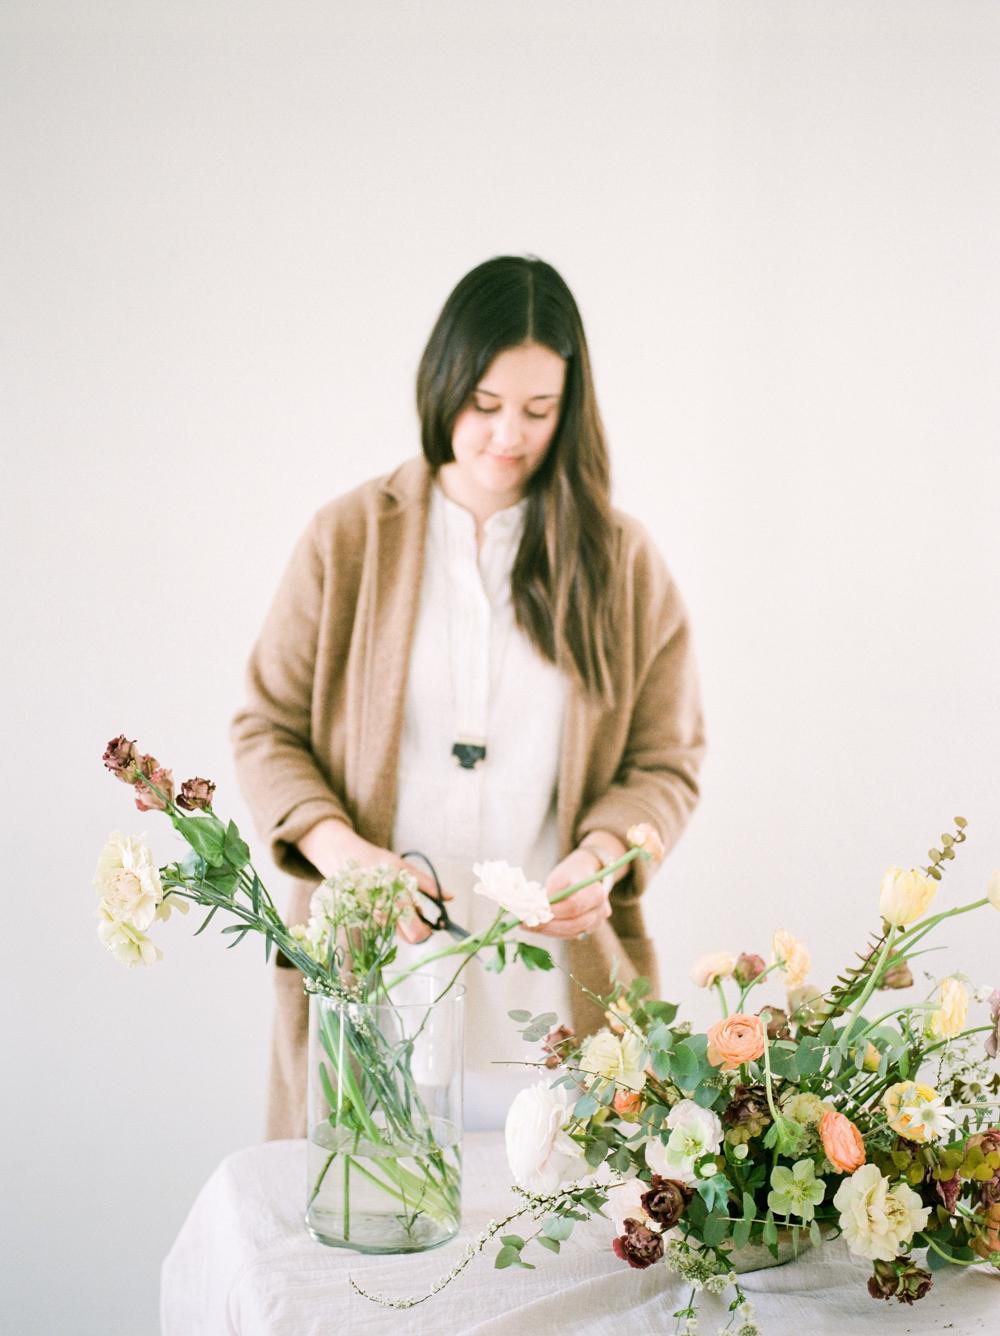 Christine-Gosch-Lexie-Sandberg-Carpe-diem-flowers-florals-design-wedding-flowers-salt-lake-city-branding-photos-styling-bridal-bouquet-centerpieces-film-photographer-5.jpg